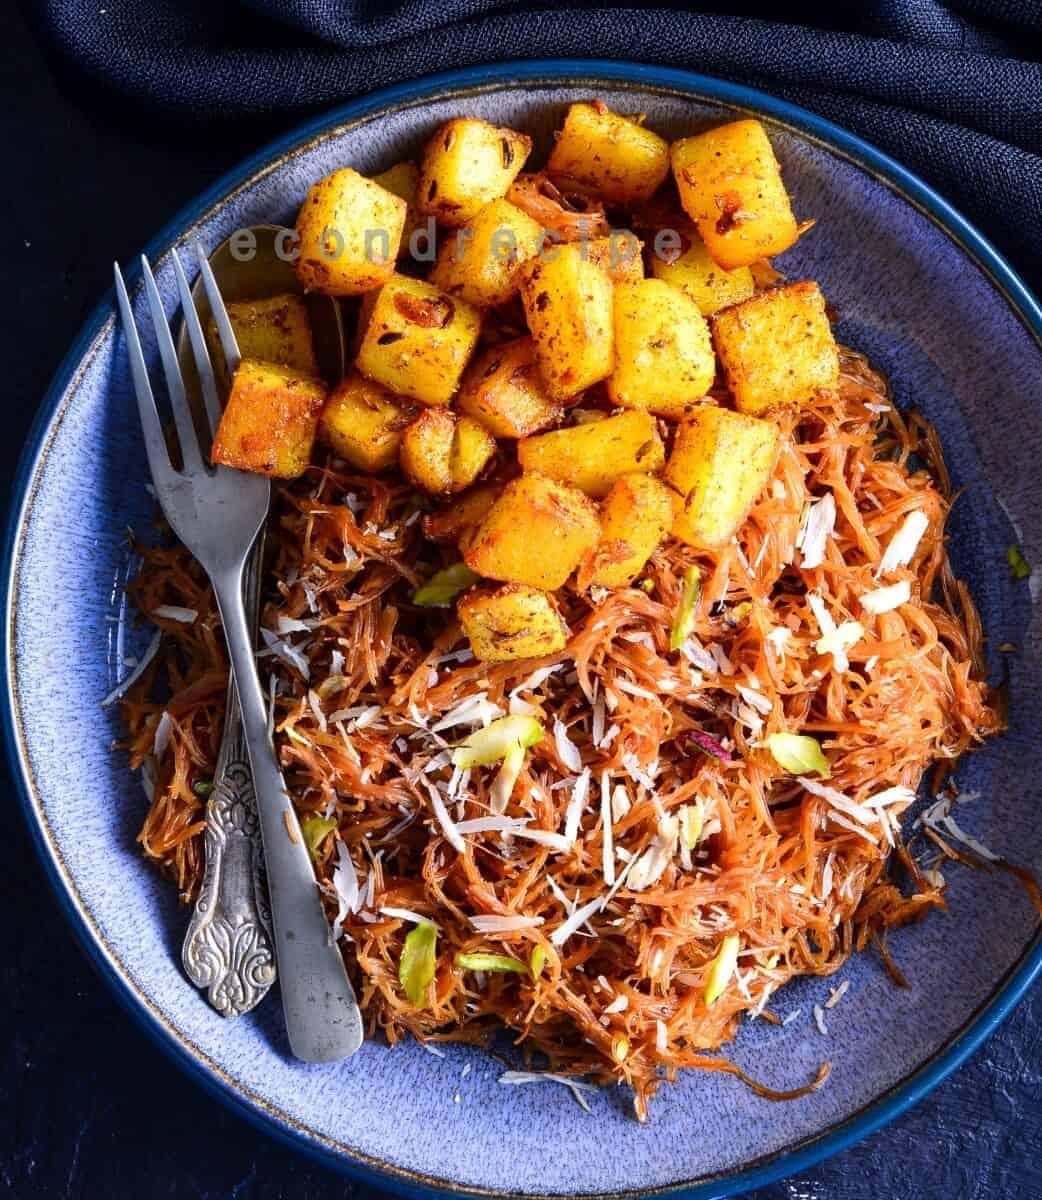 Seyun Patata-Sweet Vermicelli with fried potatoes